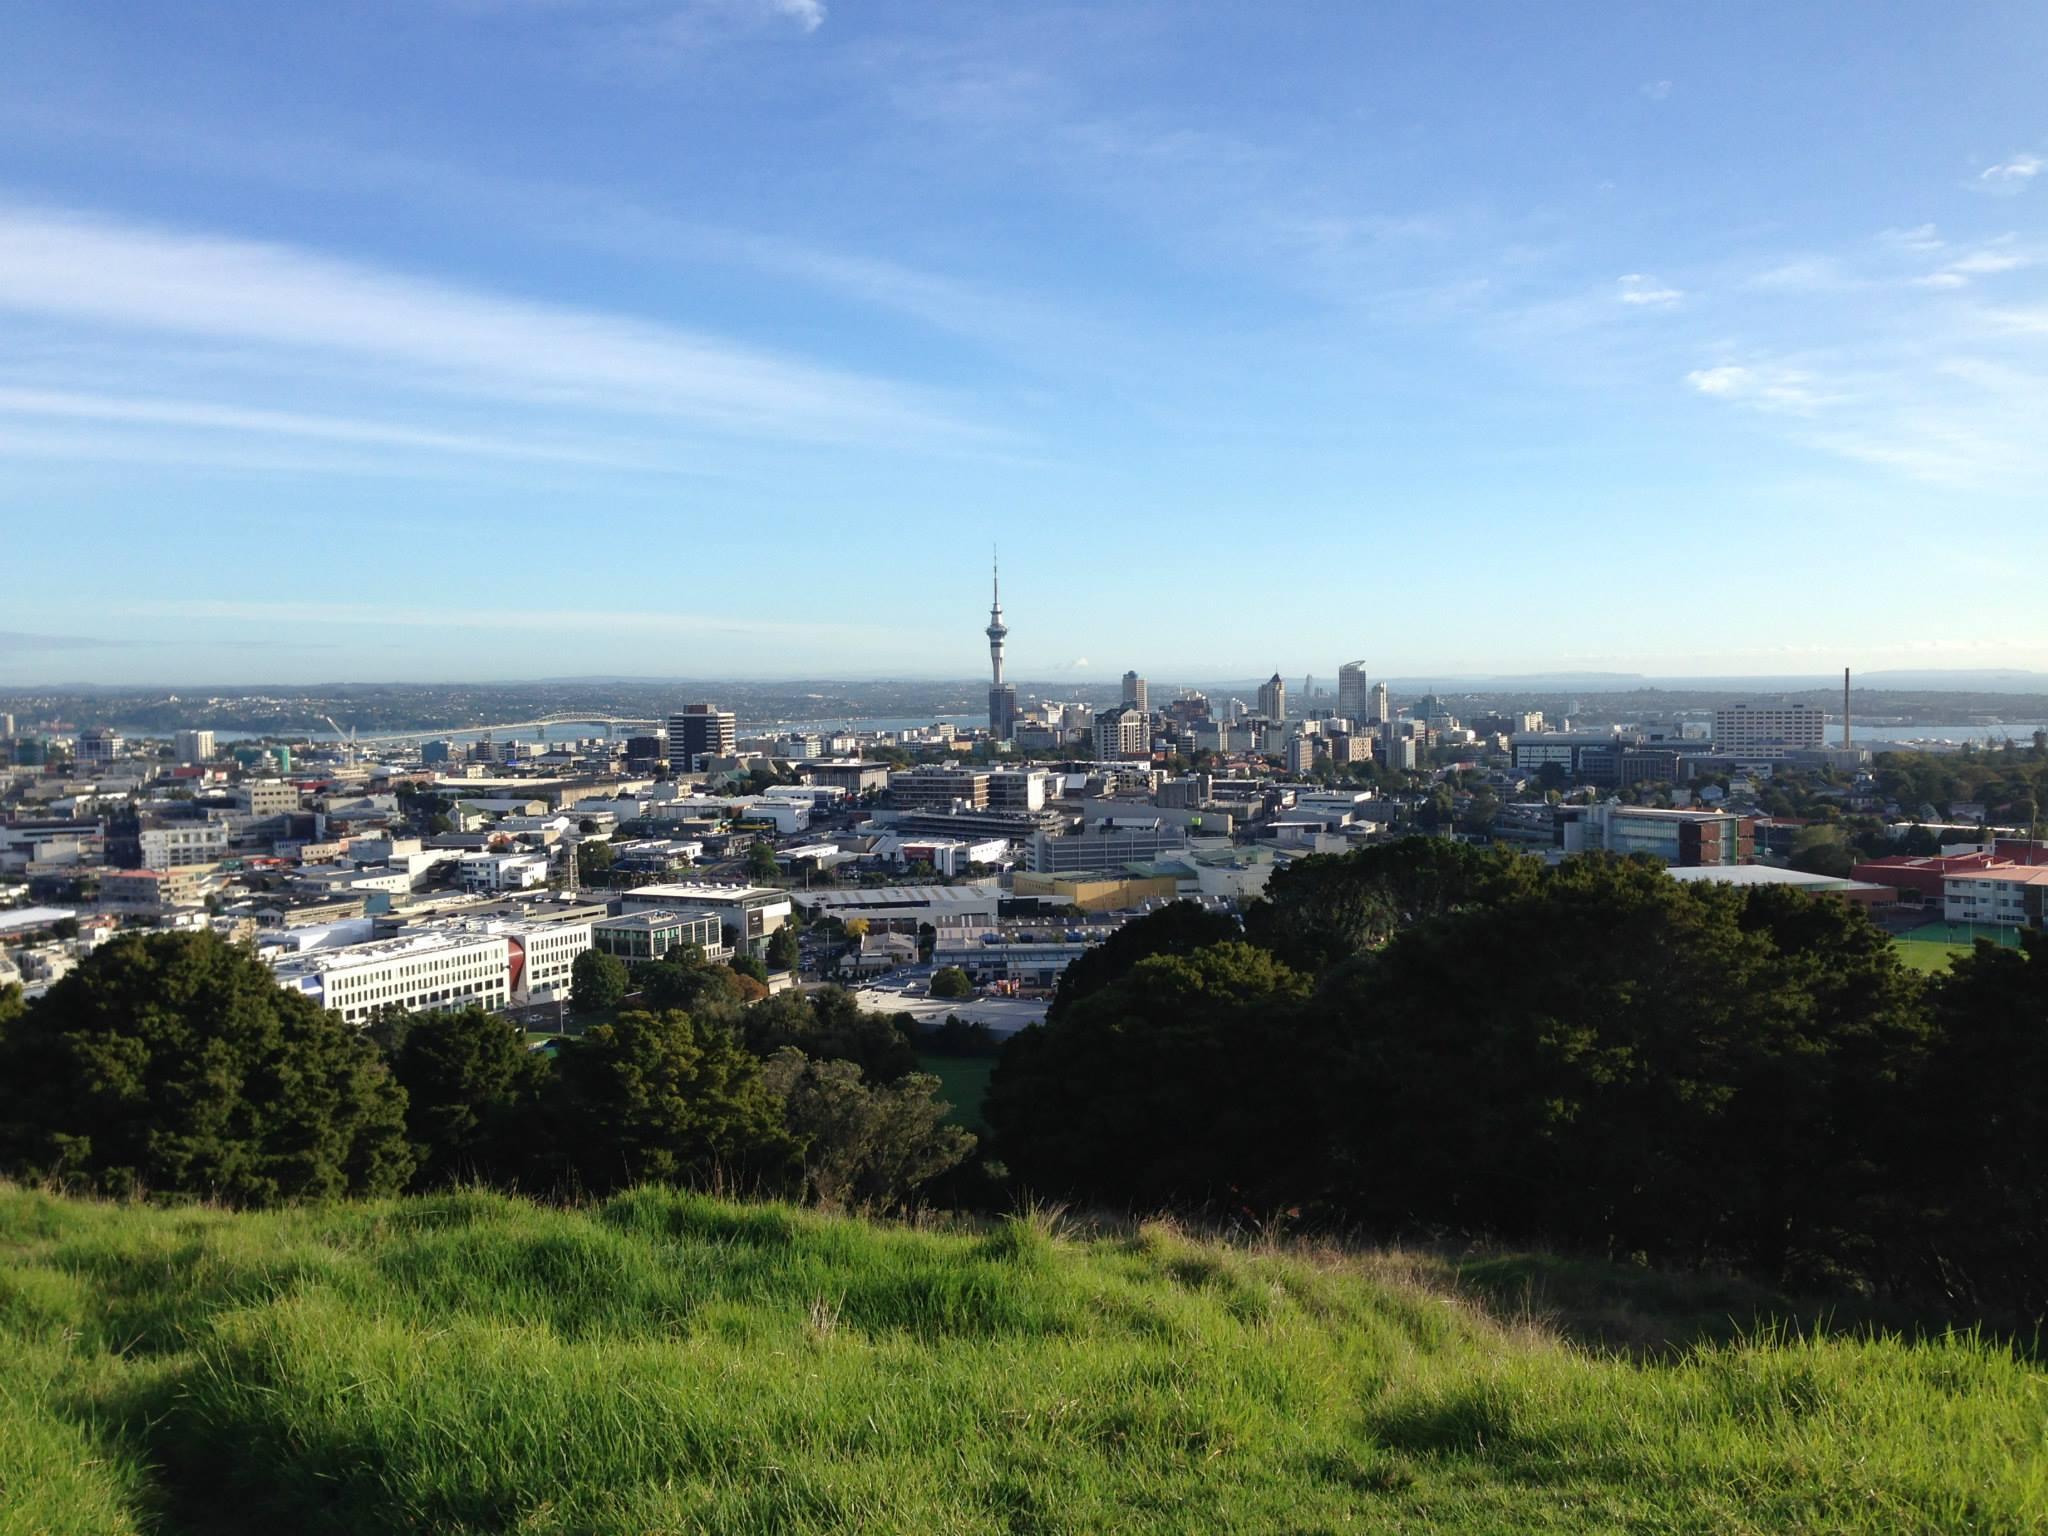 http://intranetpzl.com.br/expo-mundi/wp-content/uploads/2015/11/Auckland_Mount_Eden.jpg